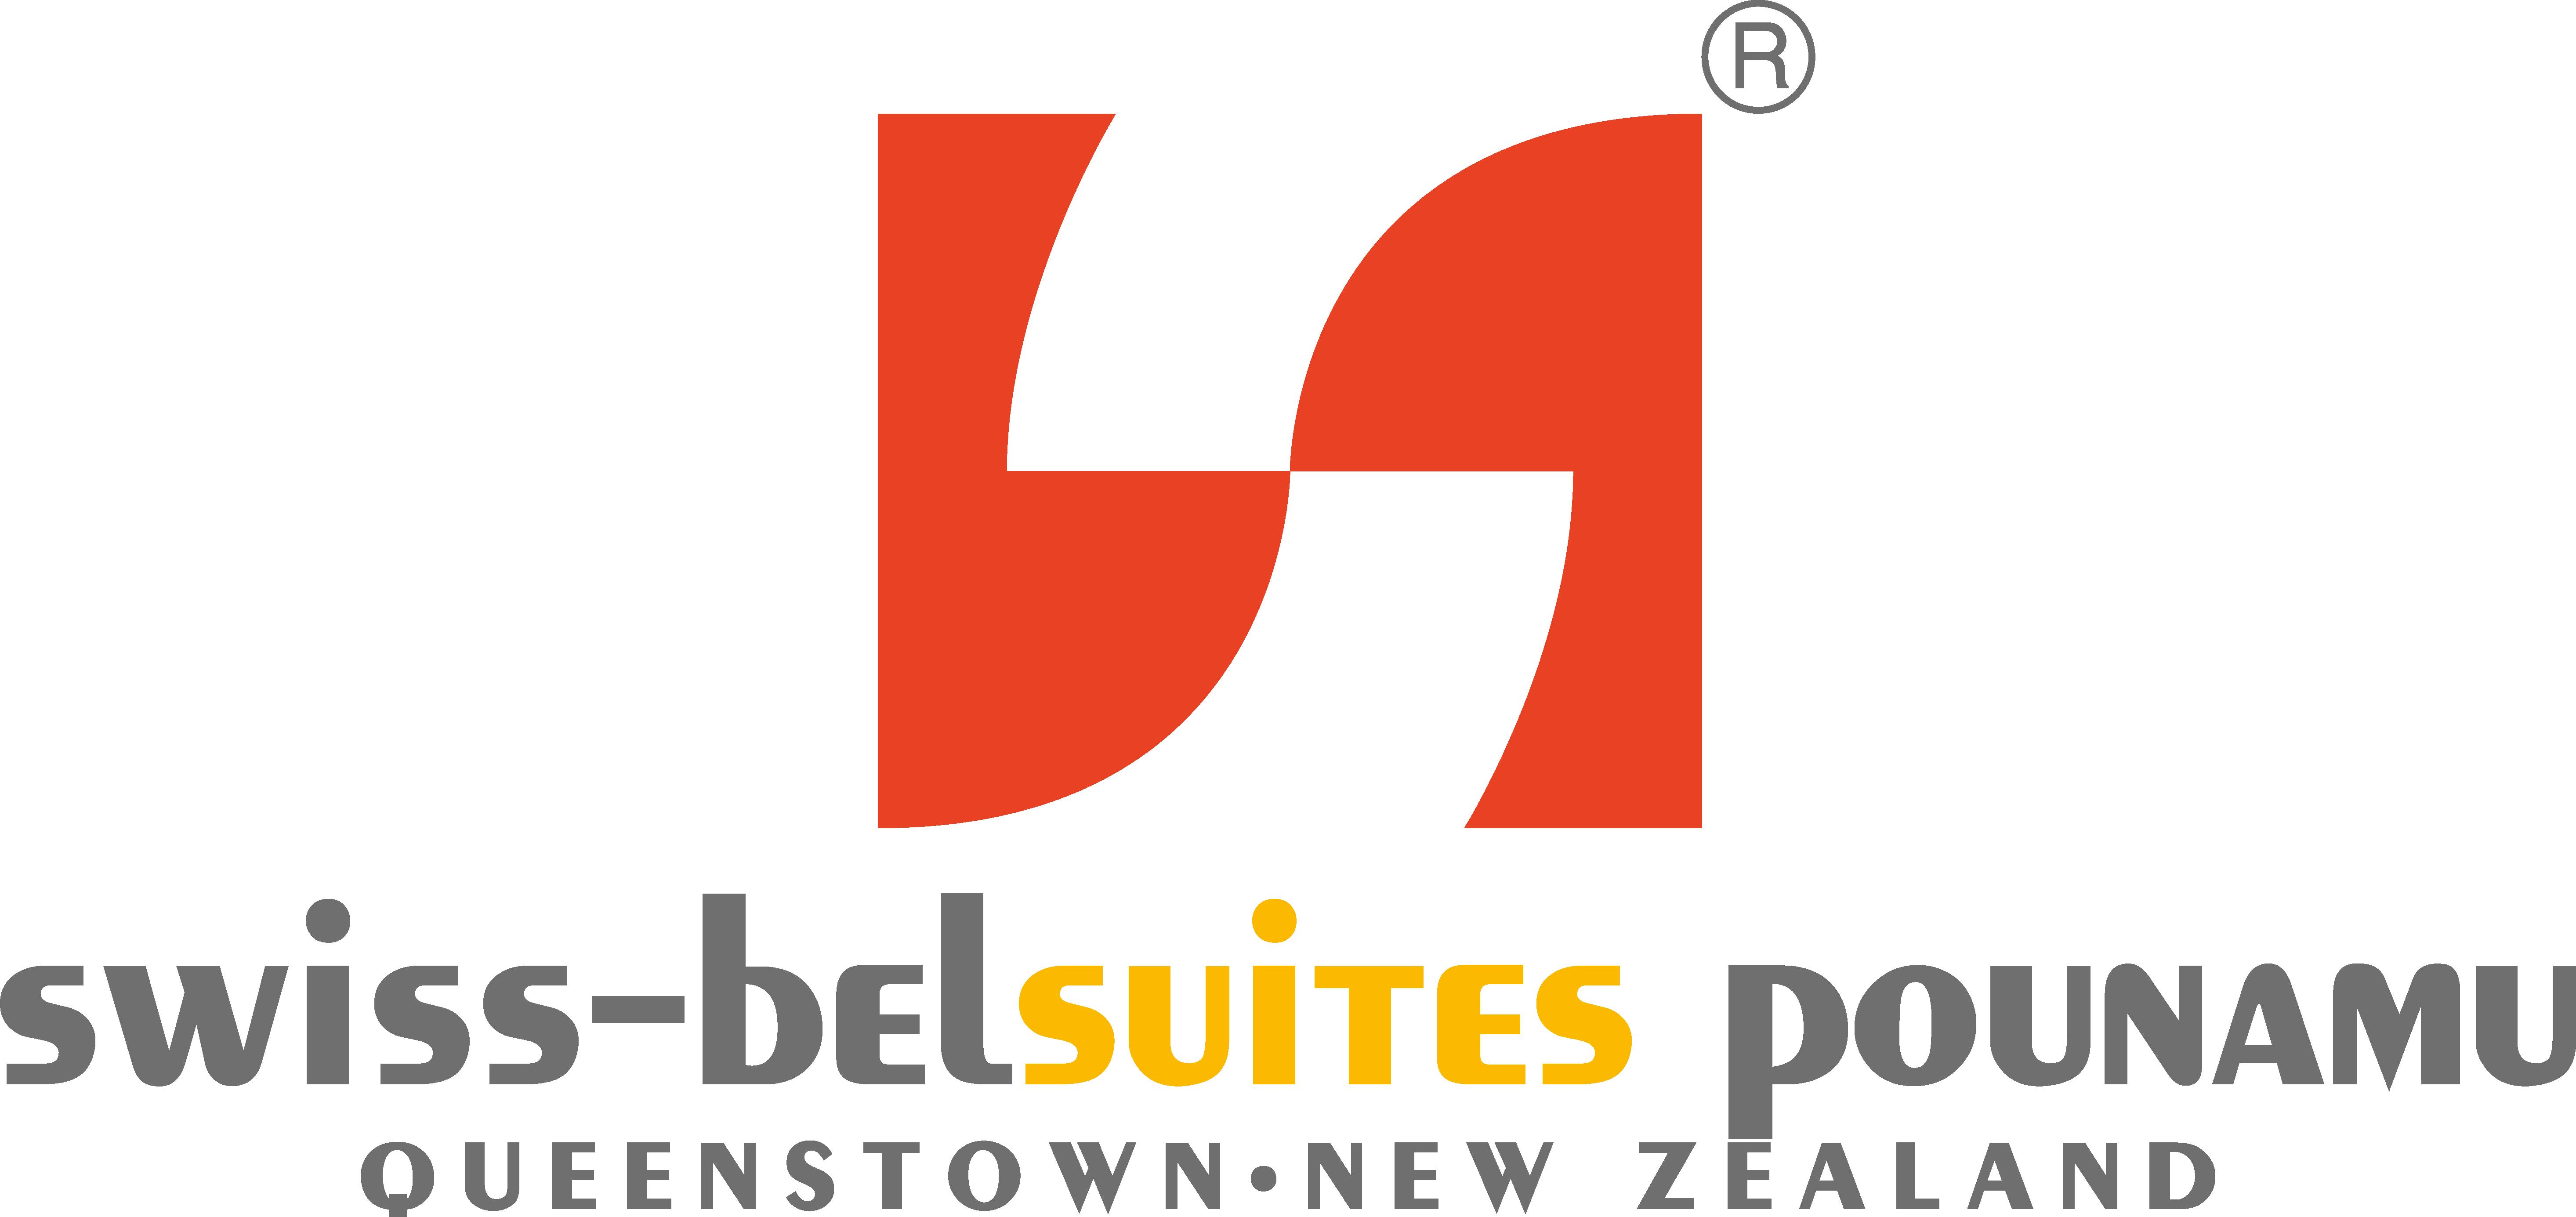 Swiss-Belsuites Pounamu Queenstown